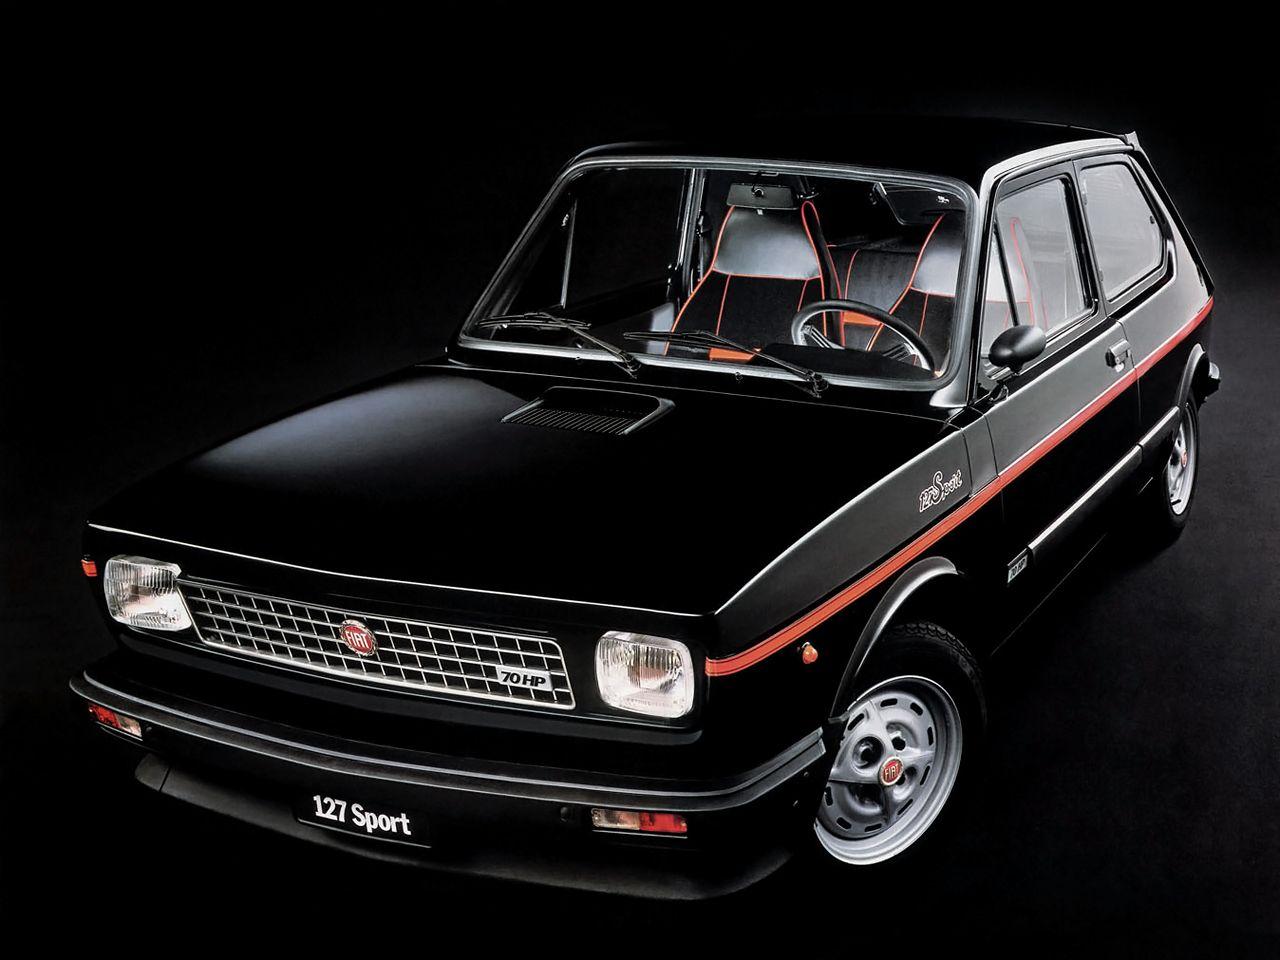 Fiat 127 Sport Triumph Voiture Voitures Retro Voiture Vintage